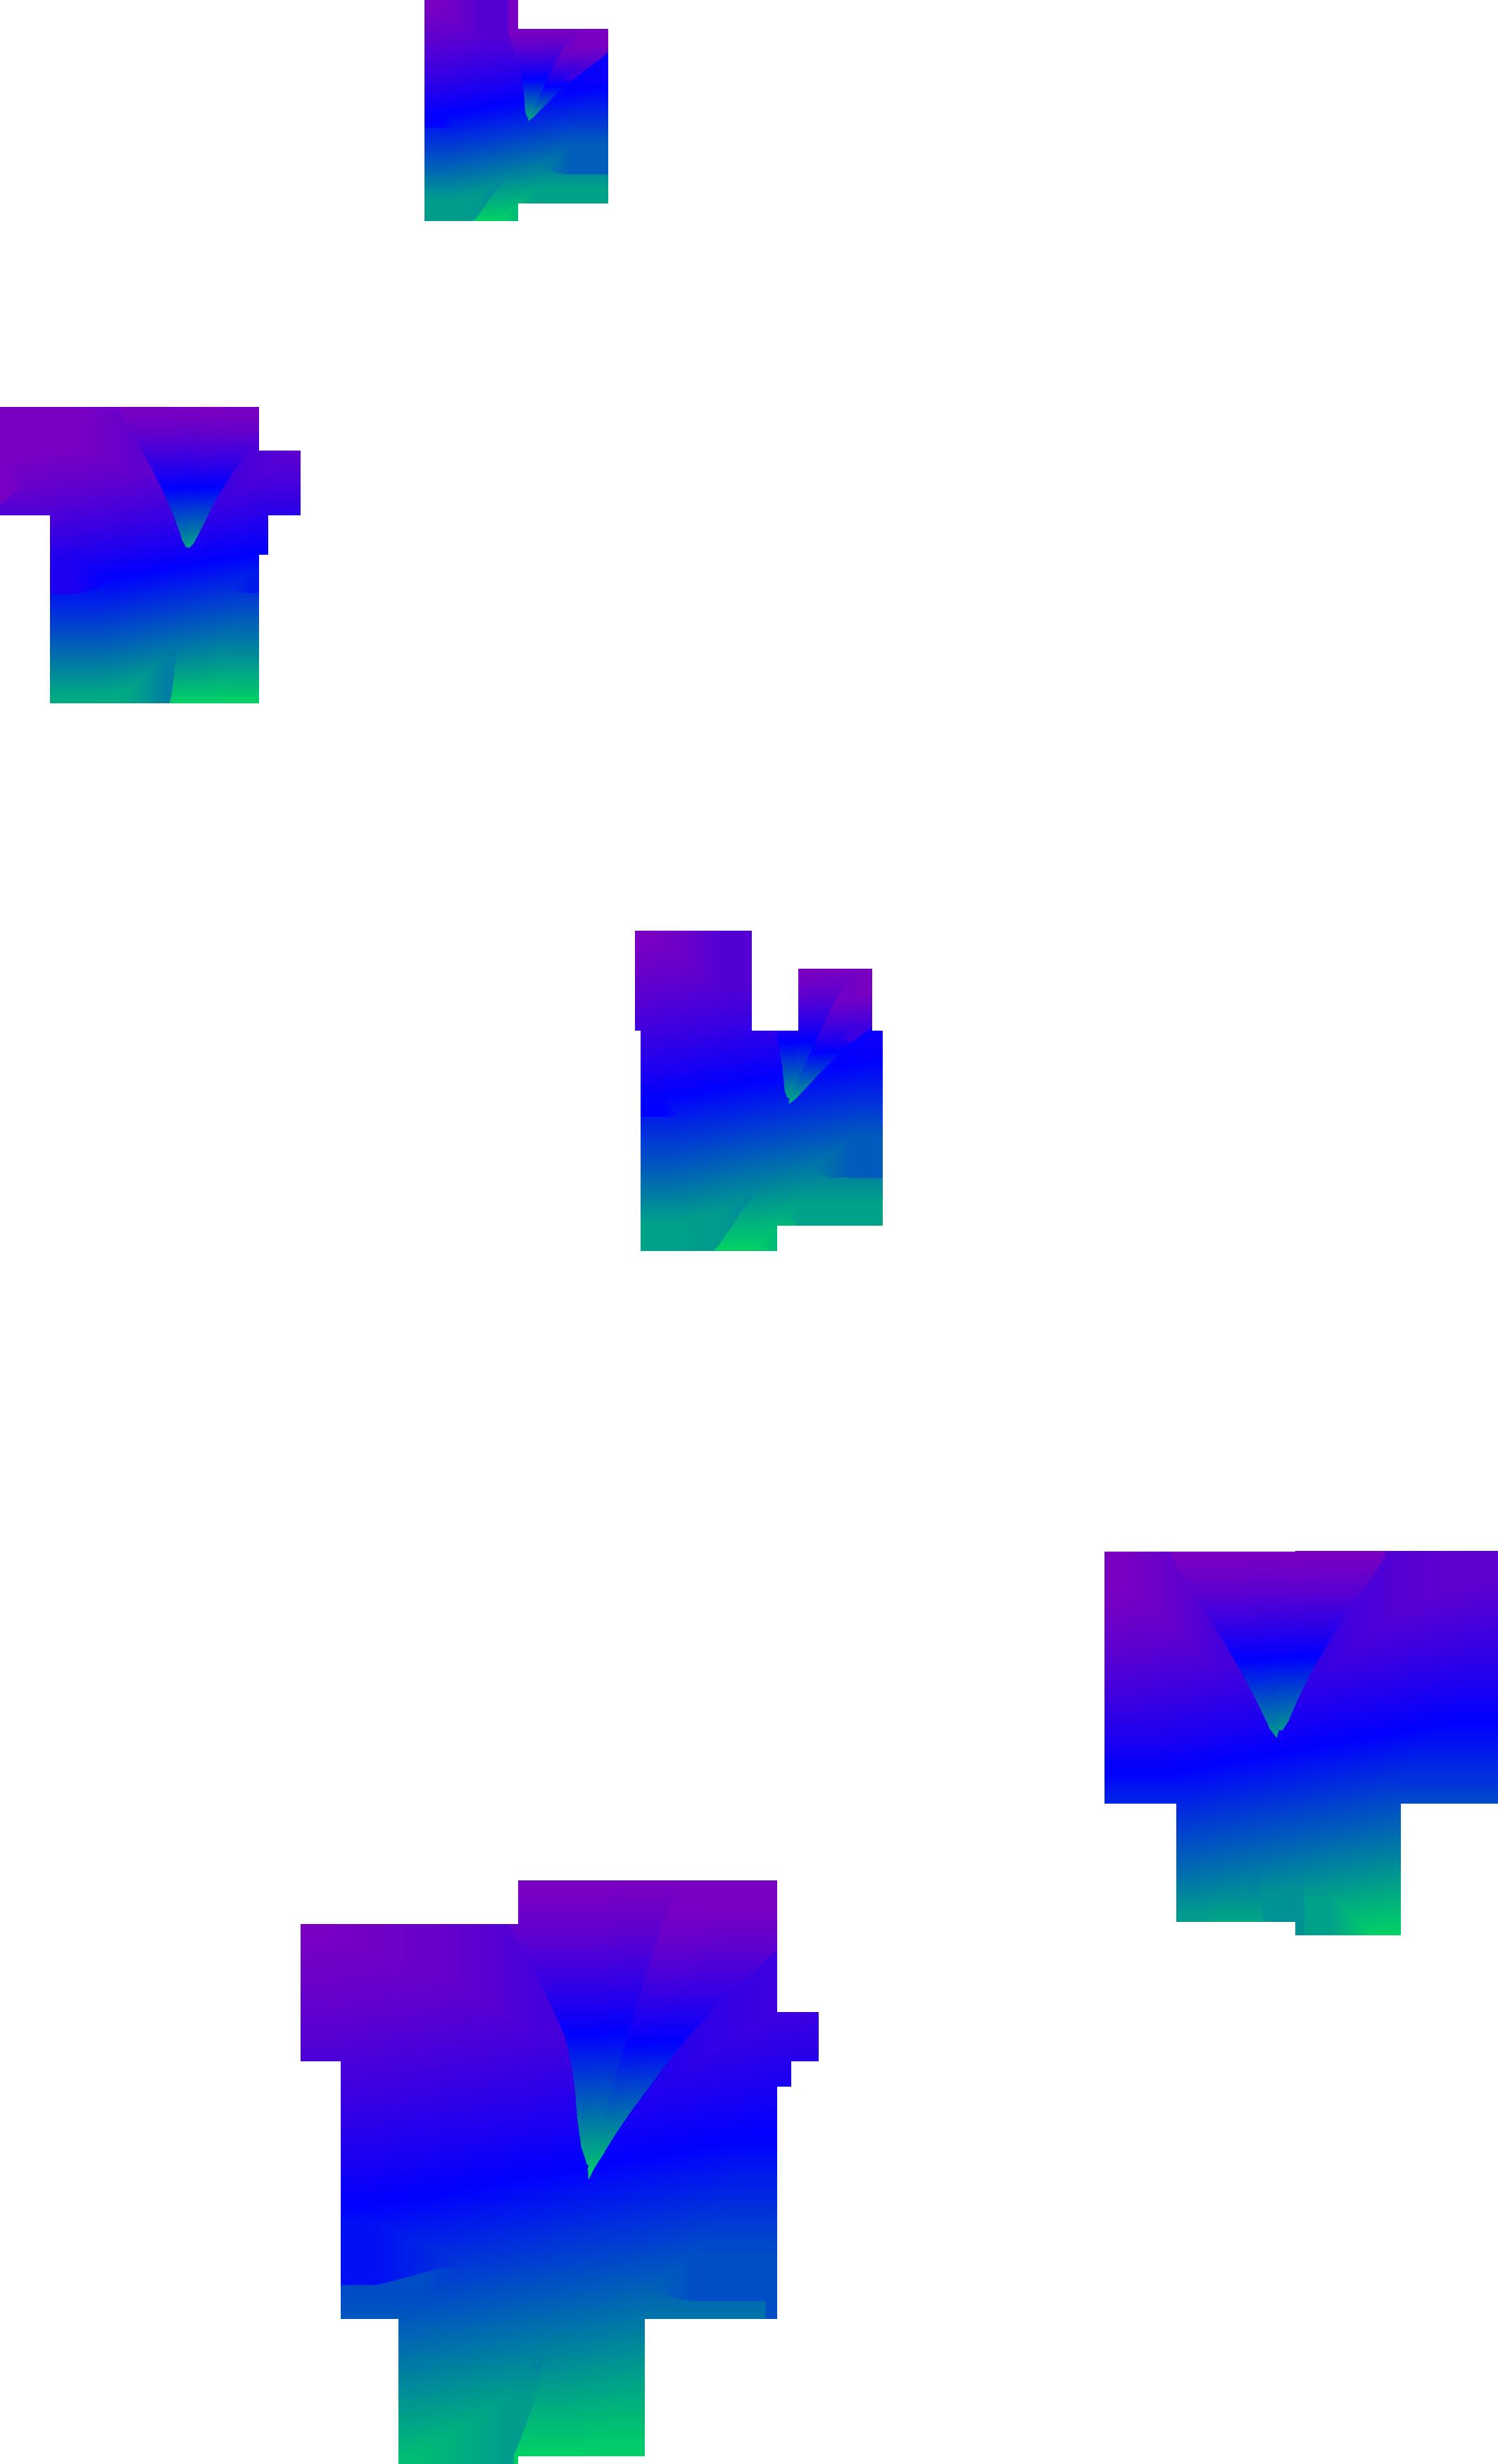 pink-butterfly-border-butterfly-20clip-20art-bcyEq9KcL pngFlower And Butterfly Border Clip Art